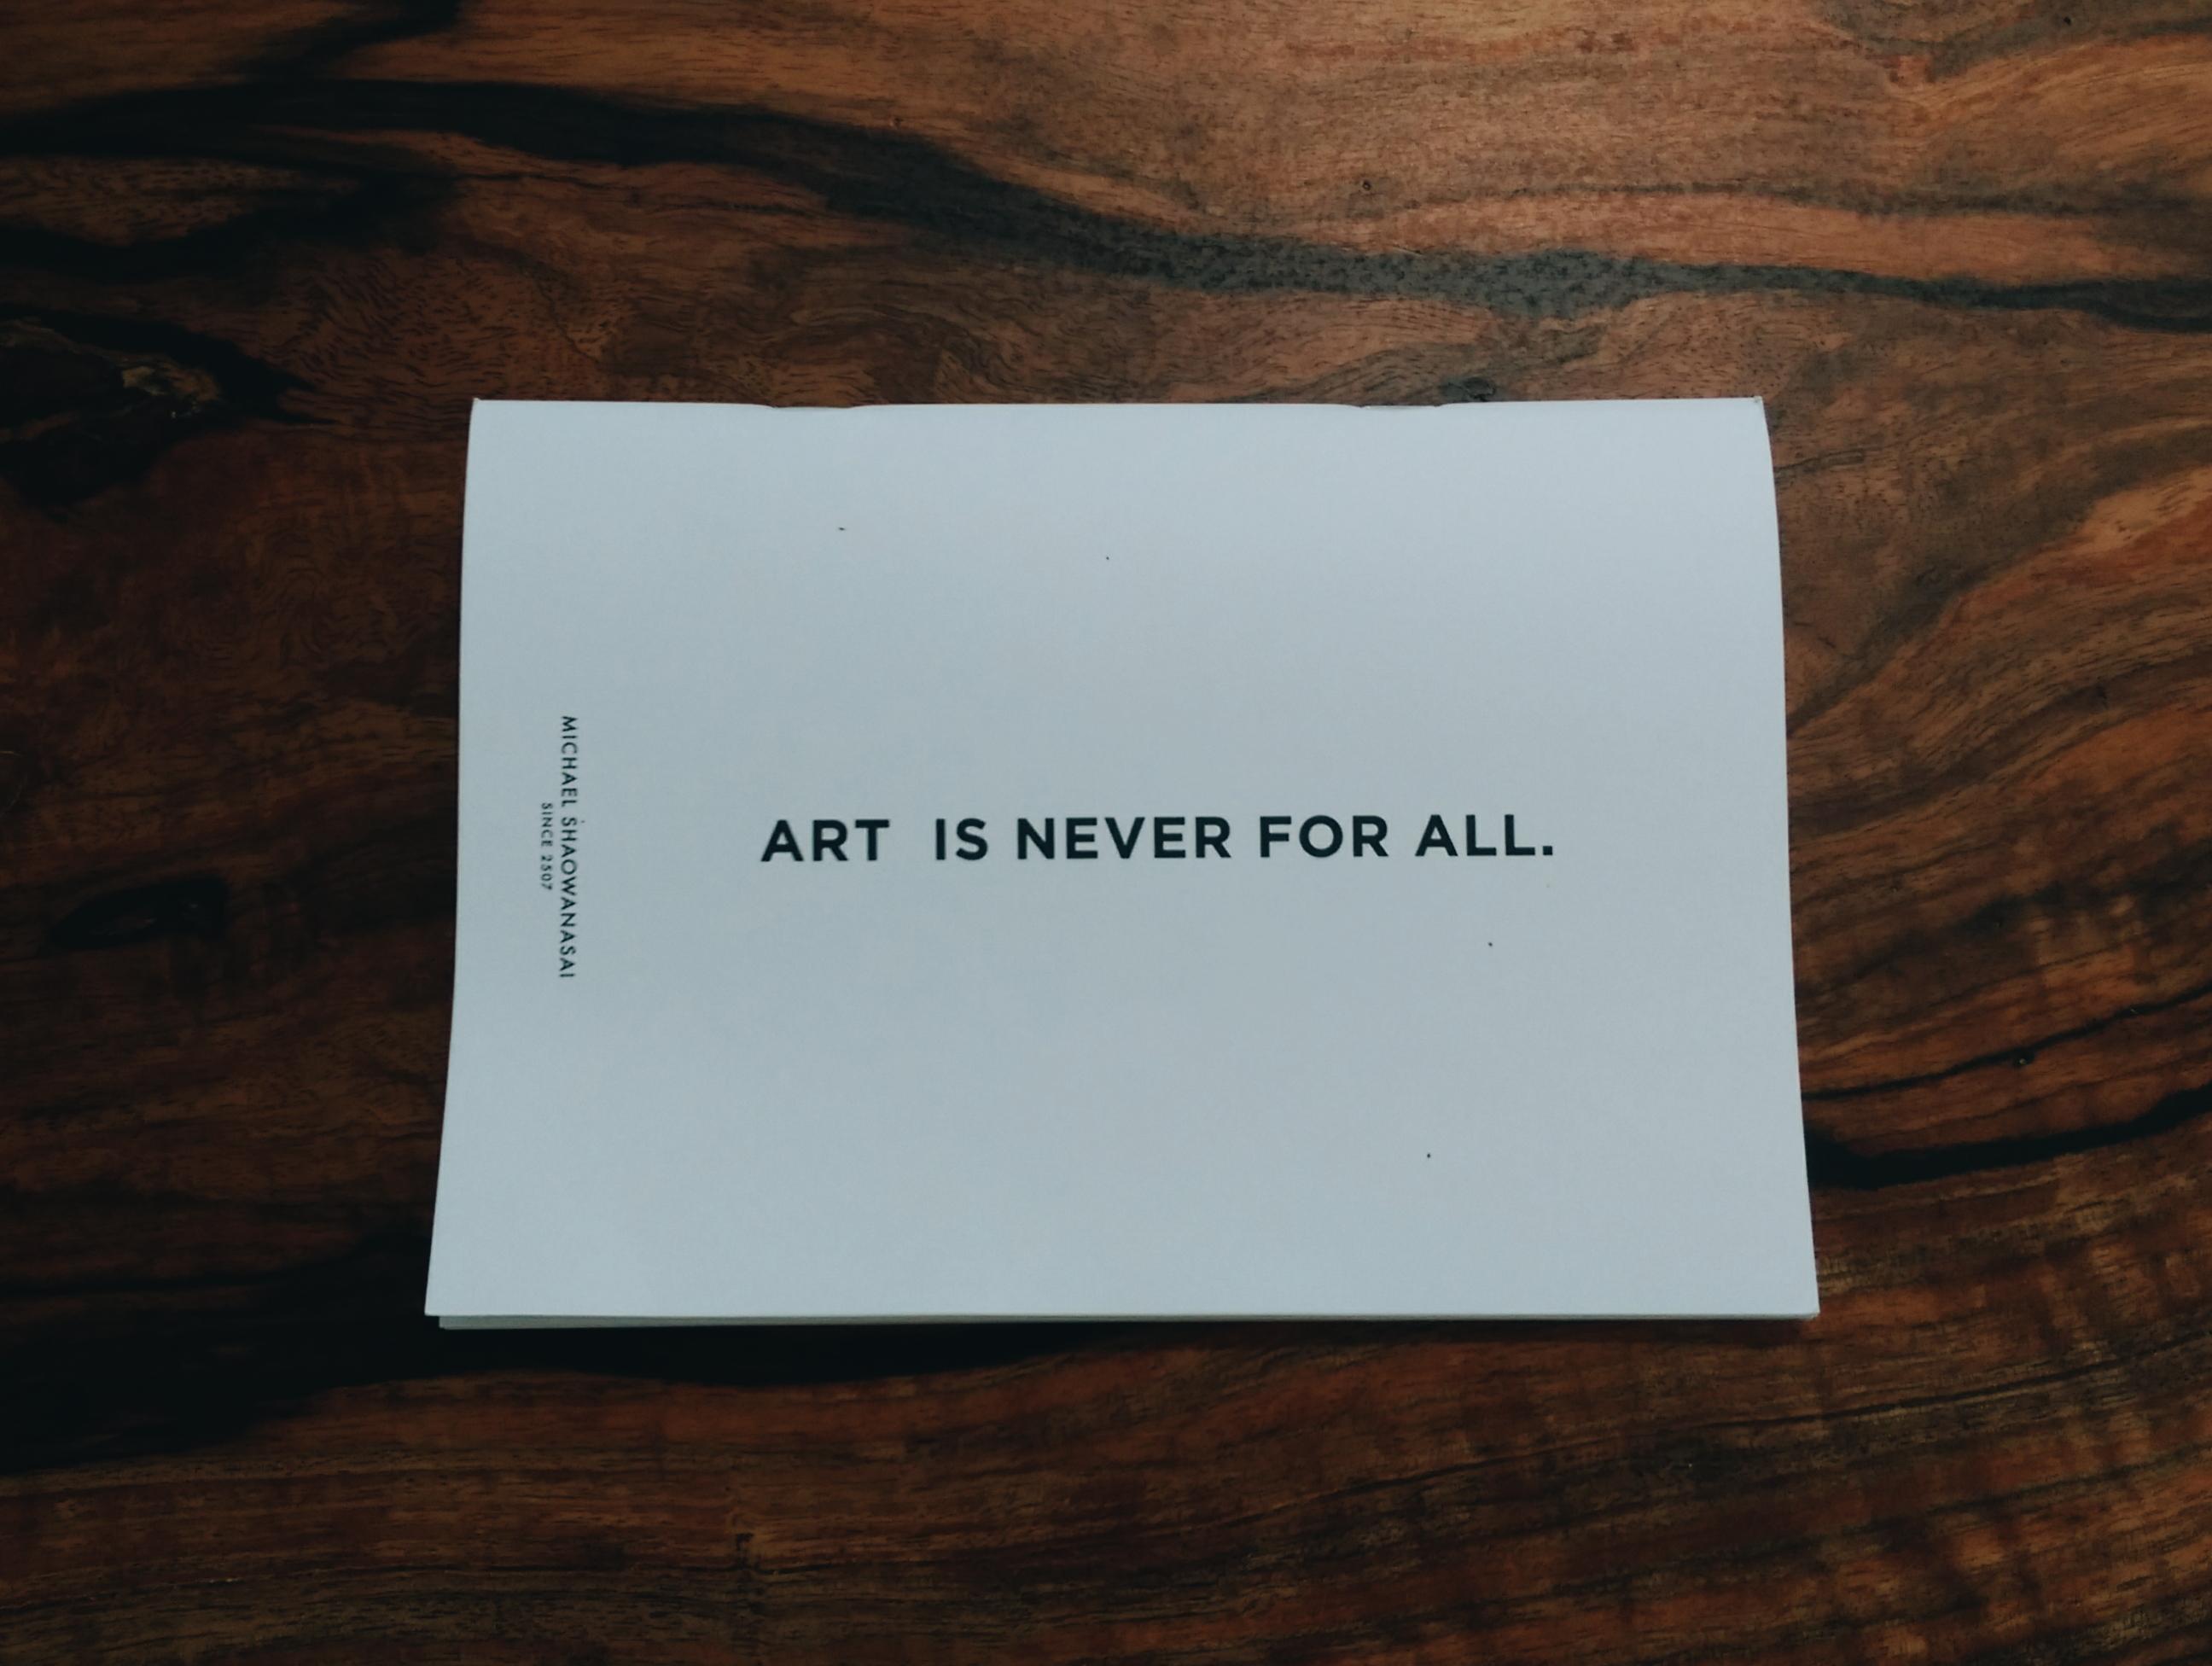 mai-iam art museum chiang mai